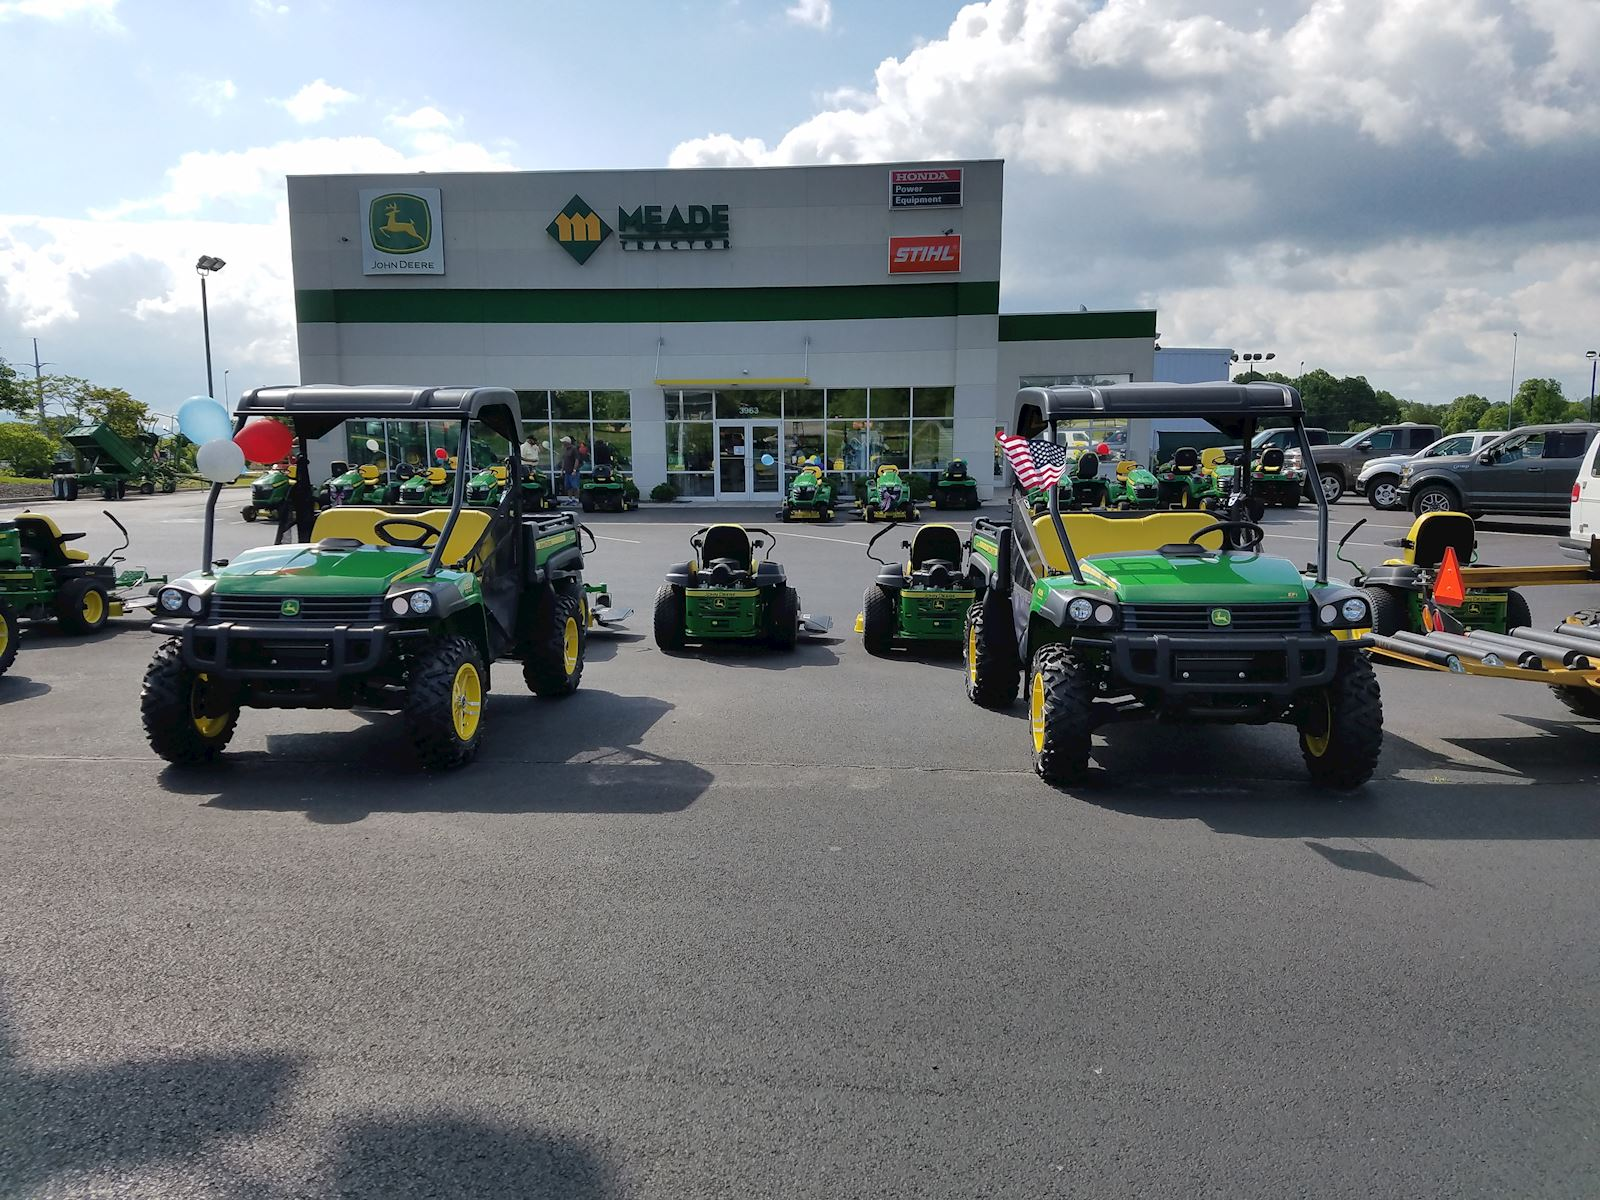 Meade Tractor of Christiansburg, Virginia